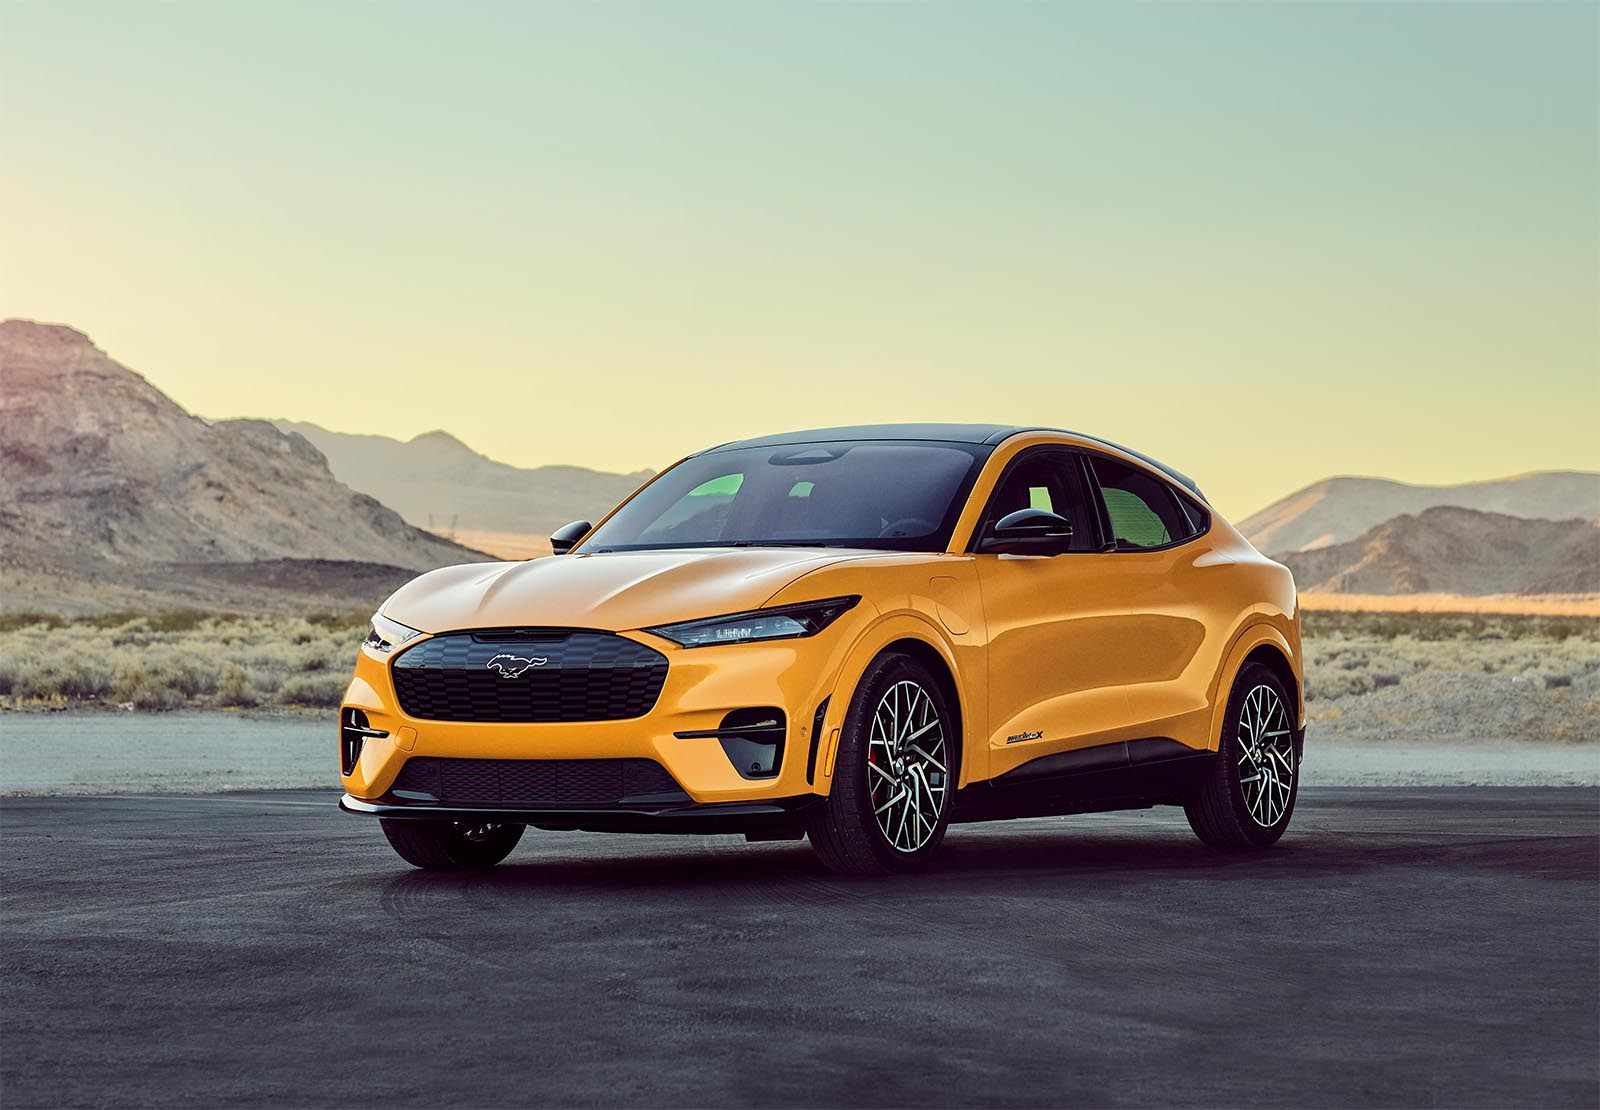 First Drive: 2021 Ford Mustang Mach-E - The Detroit Bureau